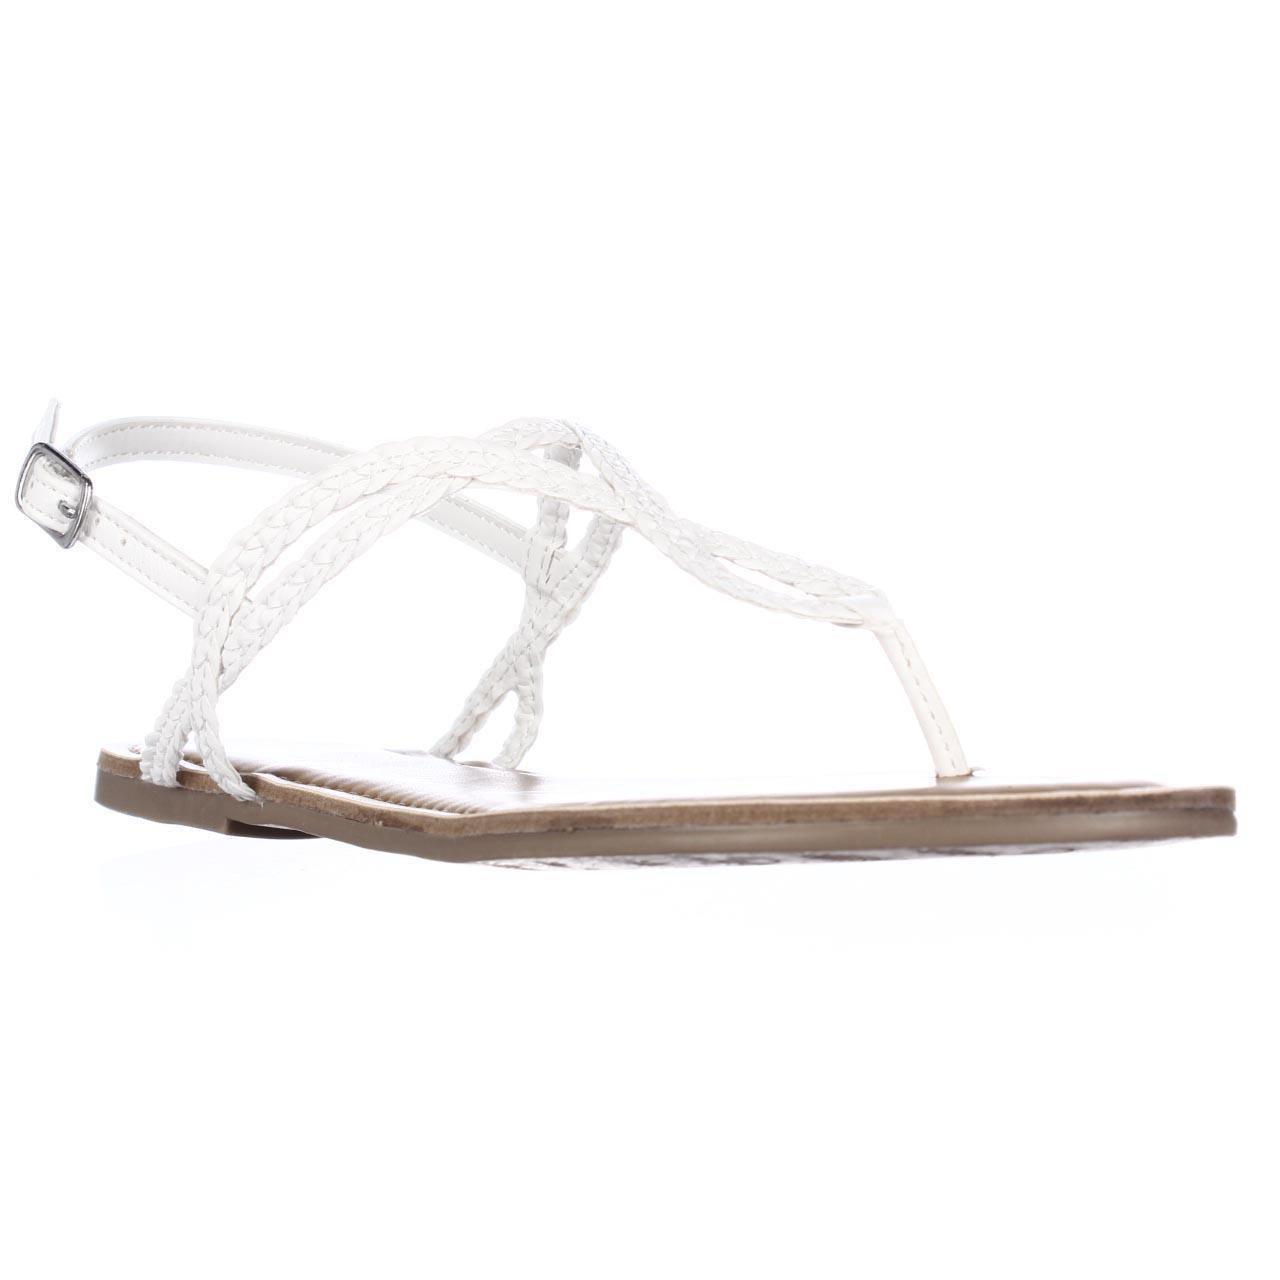 ff49de0268a7 American Rag. Women s Ar35 Keira Braided Thong Flat Sandals ...